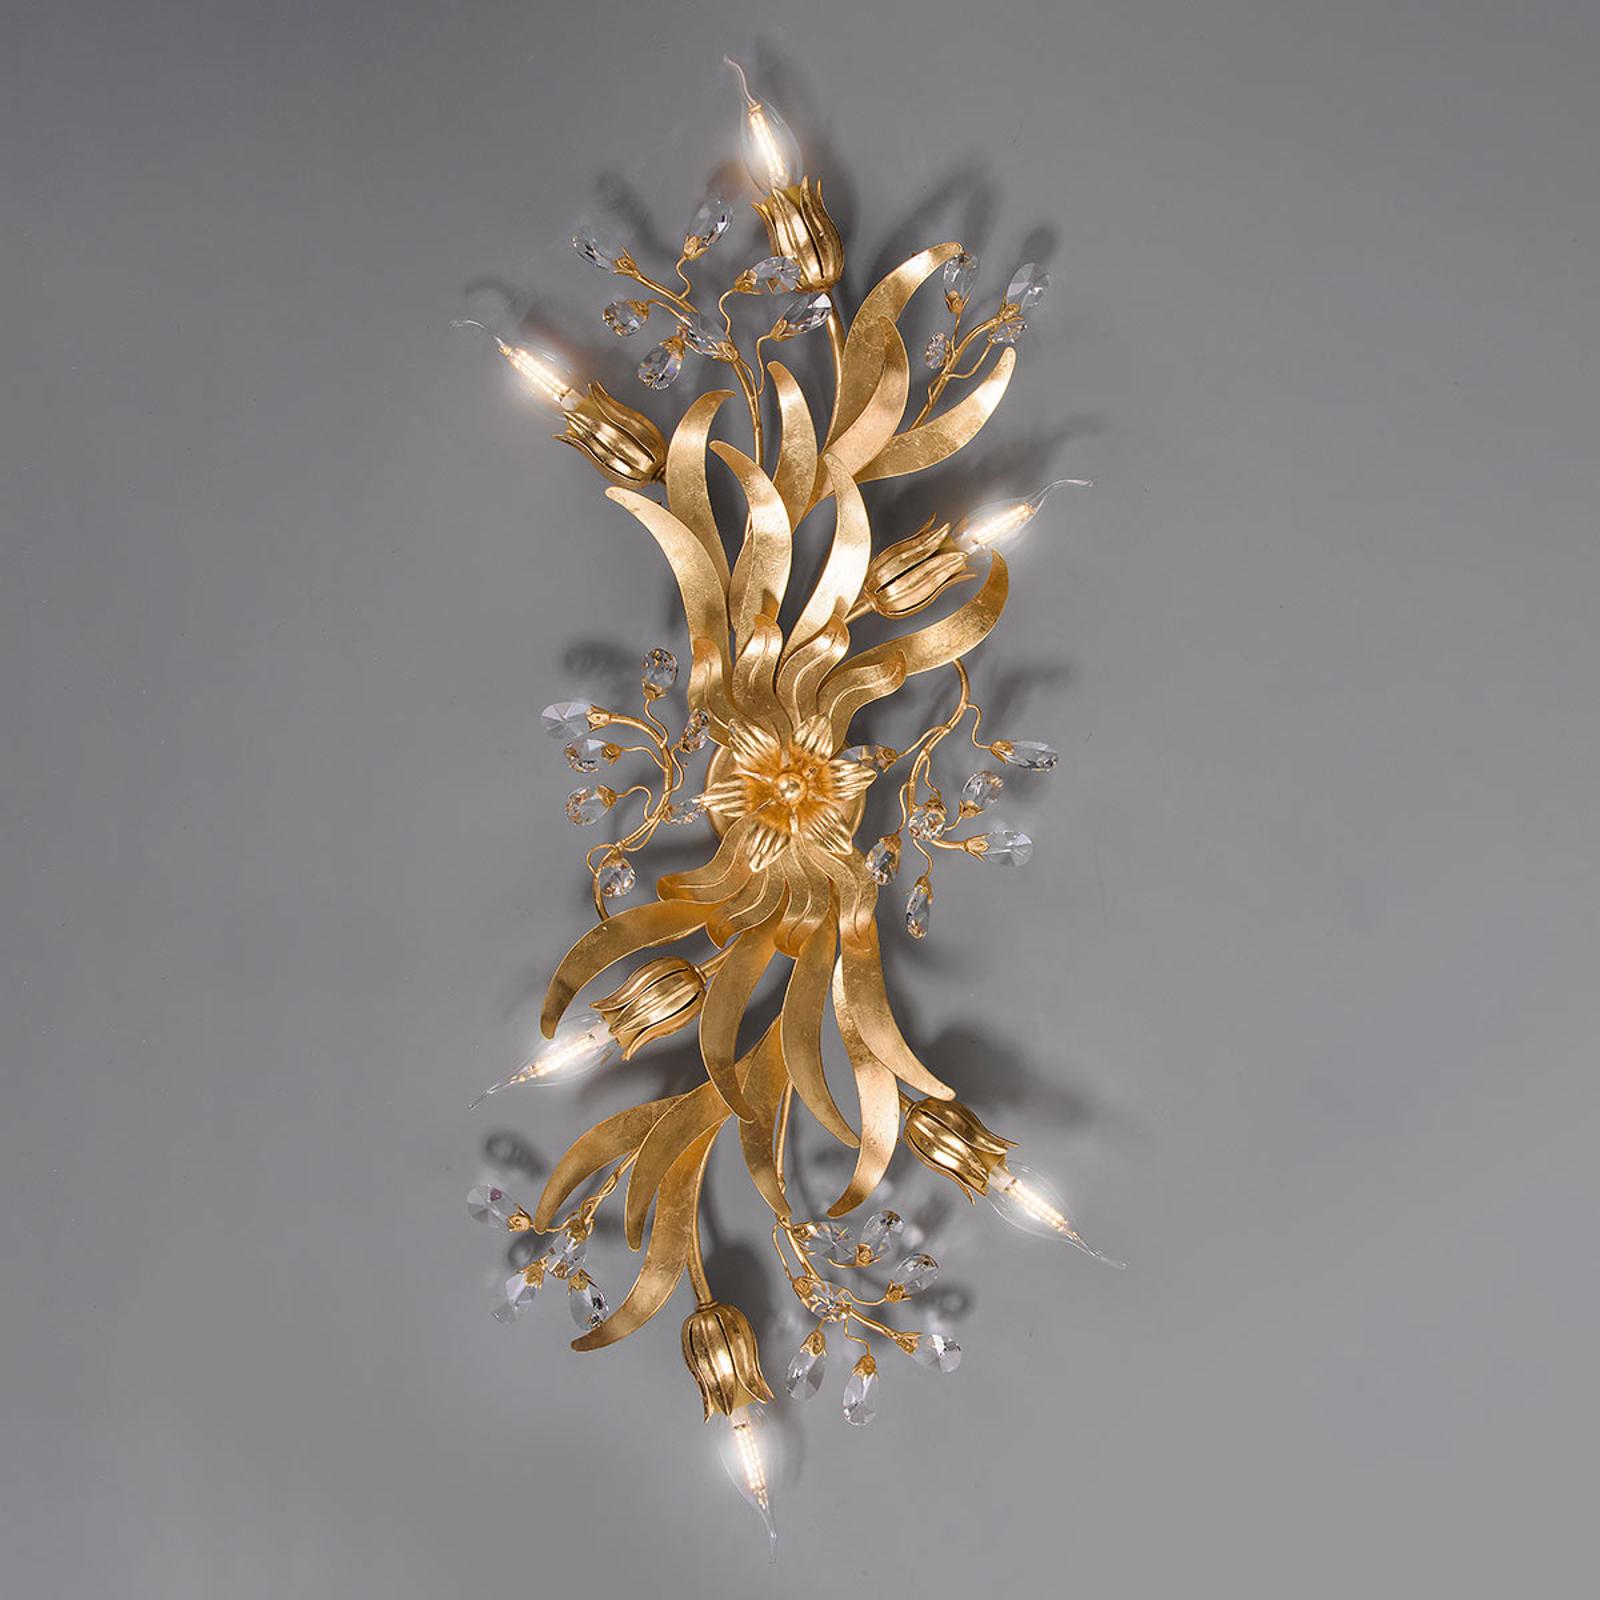 Plafondlamp 77/6 PL, 6-lamps met bladgoud